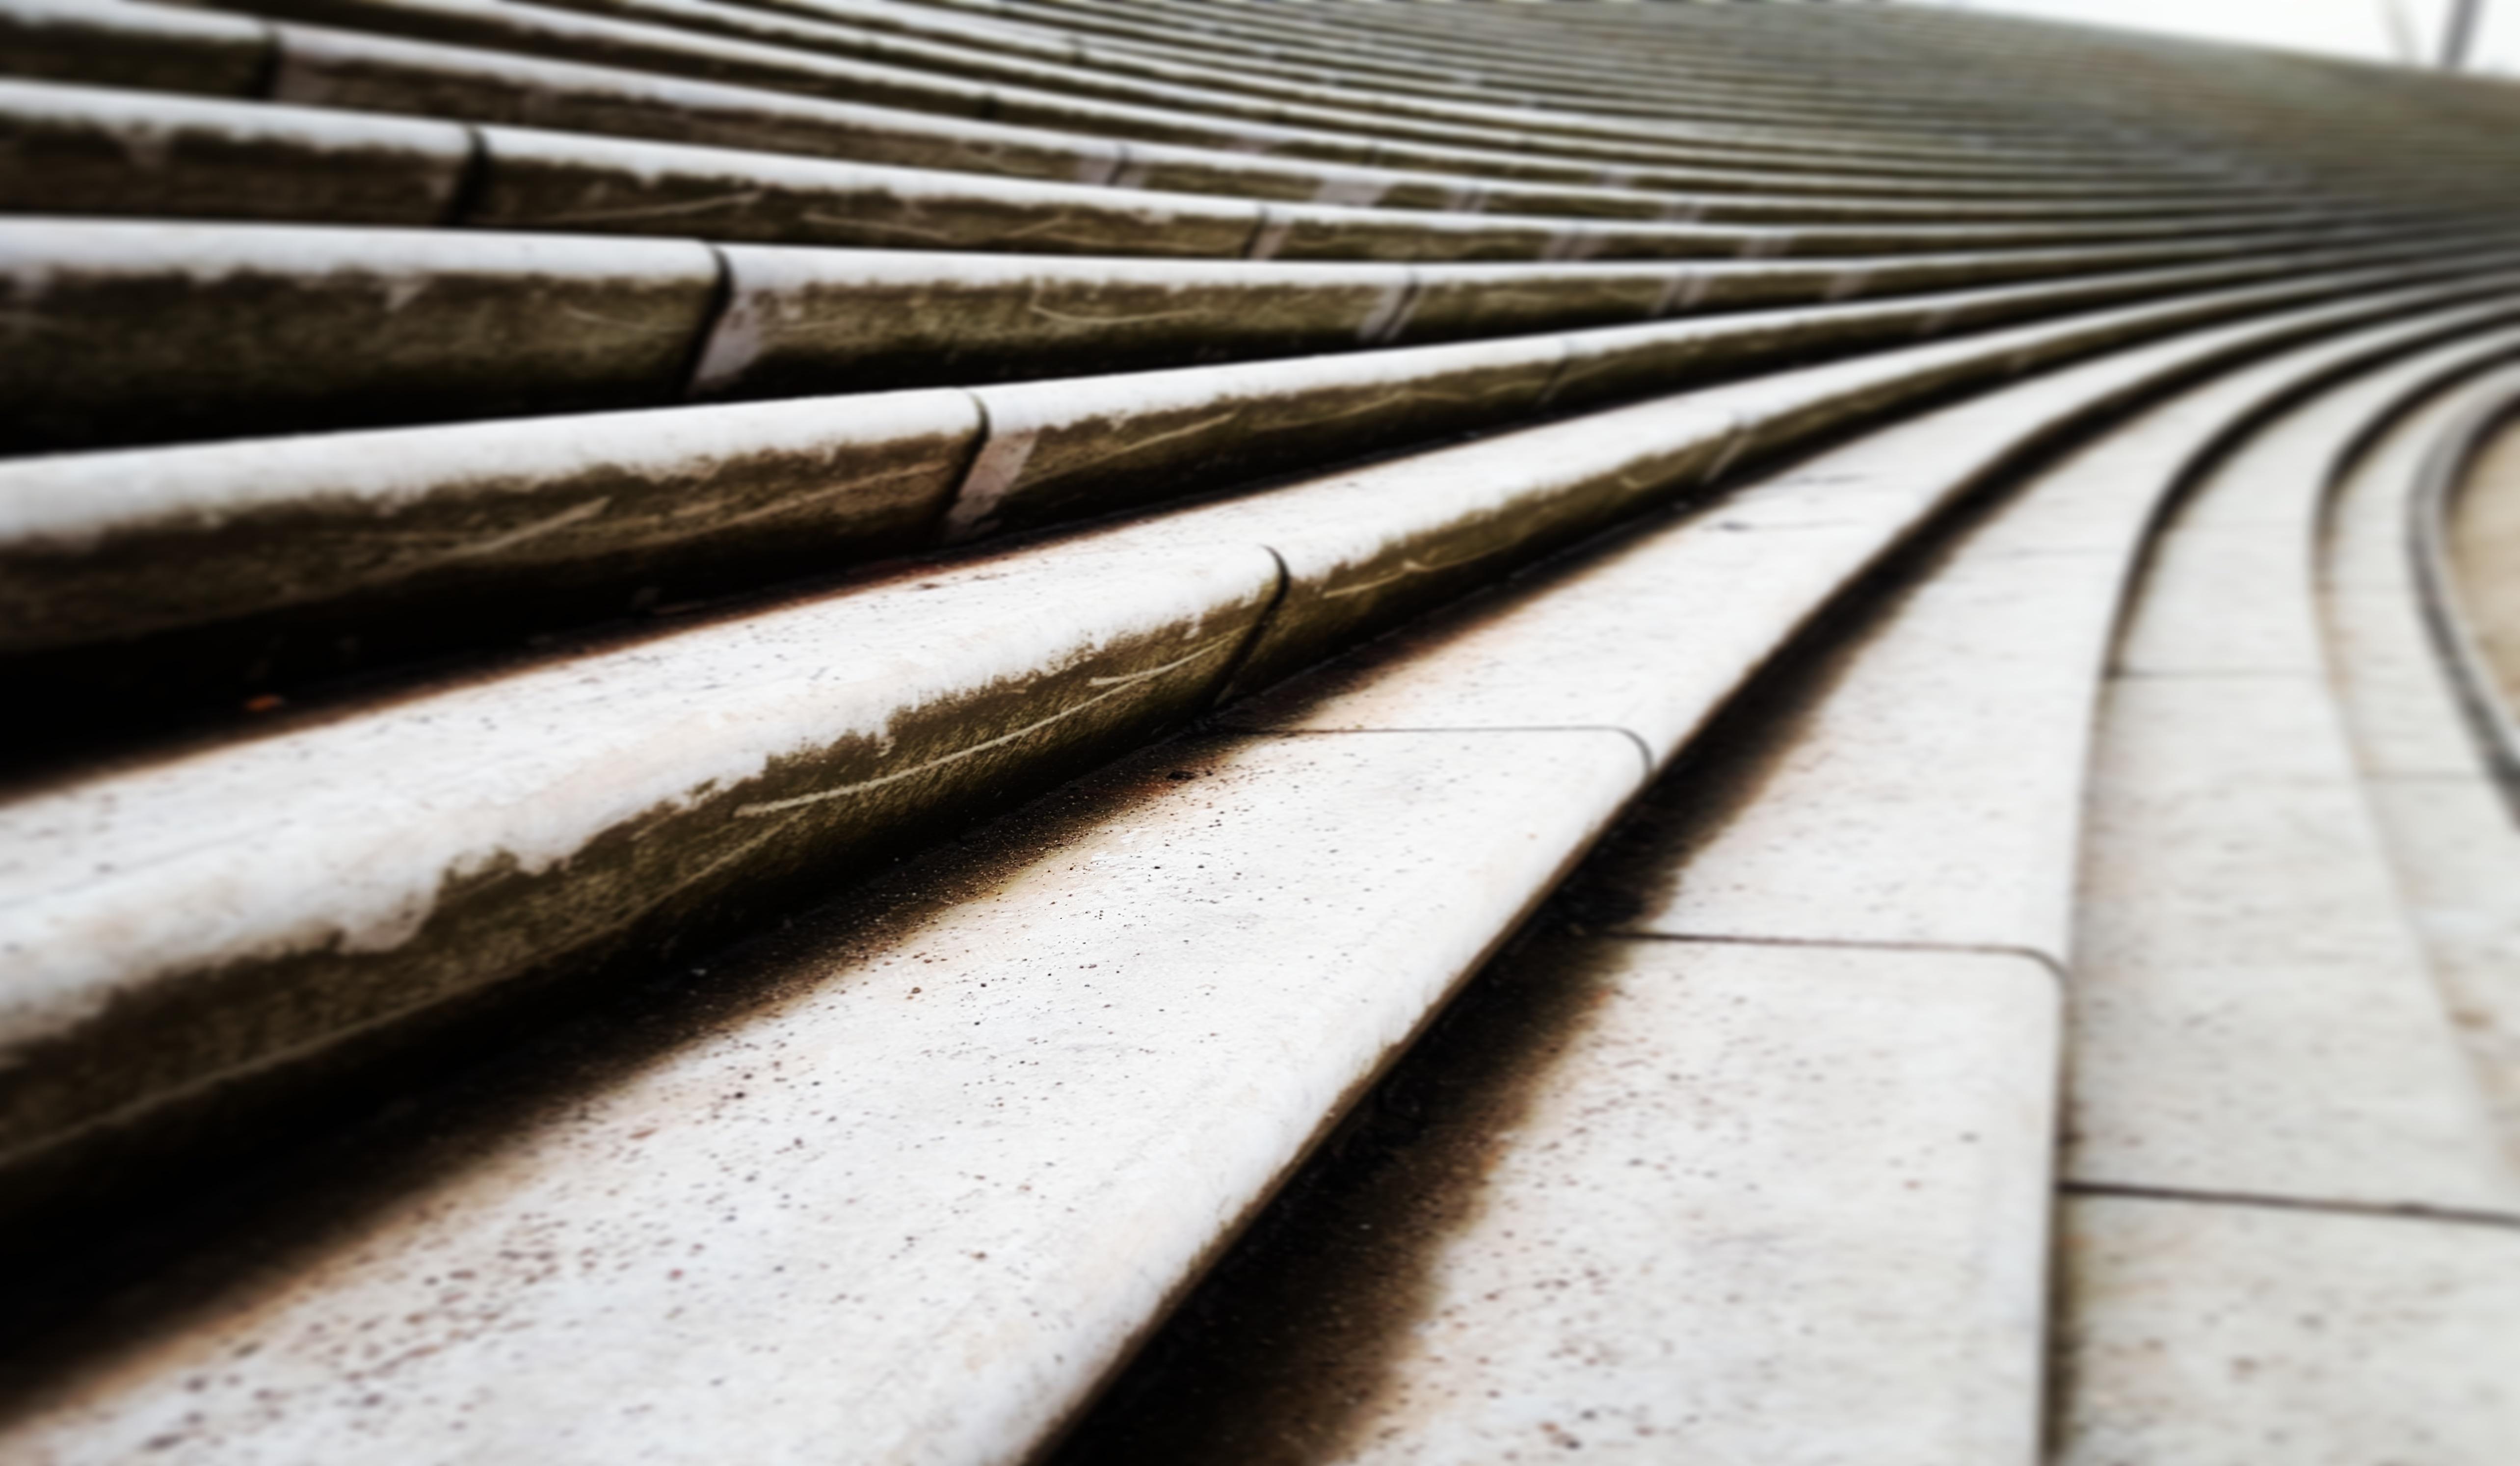 fotos gratis creativo ala difuminar estructura madera pista blanco piso edificio pared lnea color espacio puerto